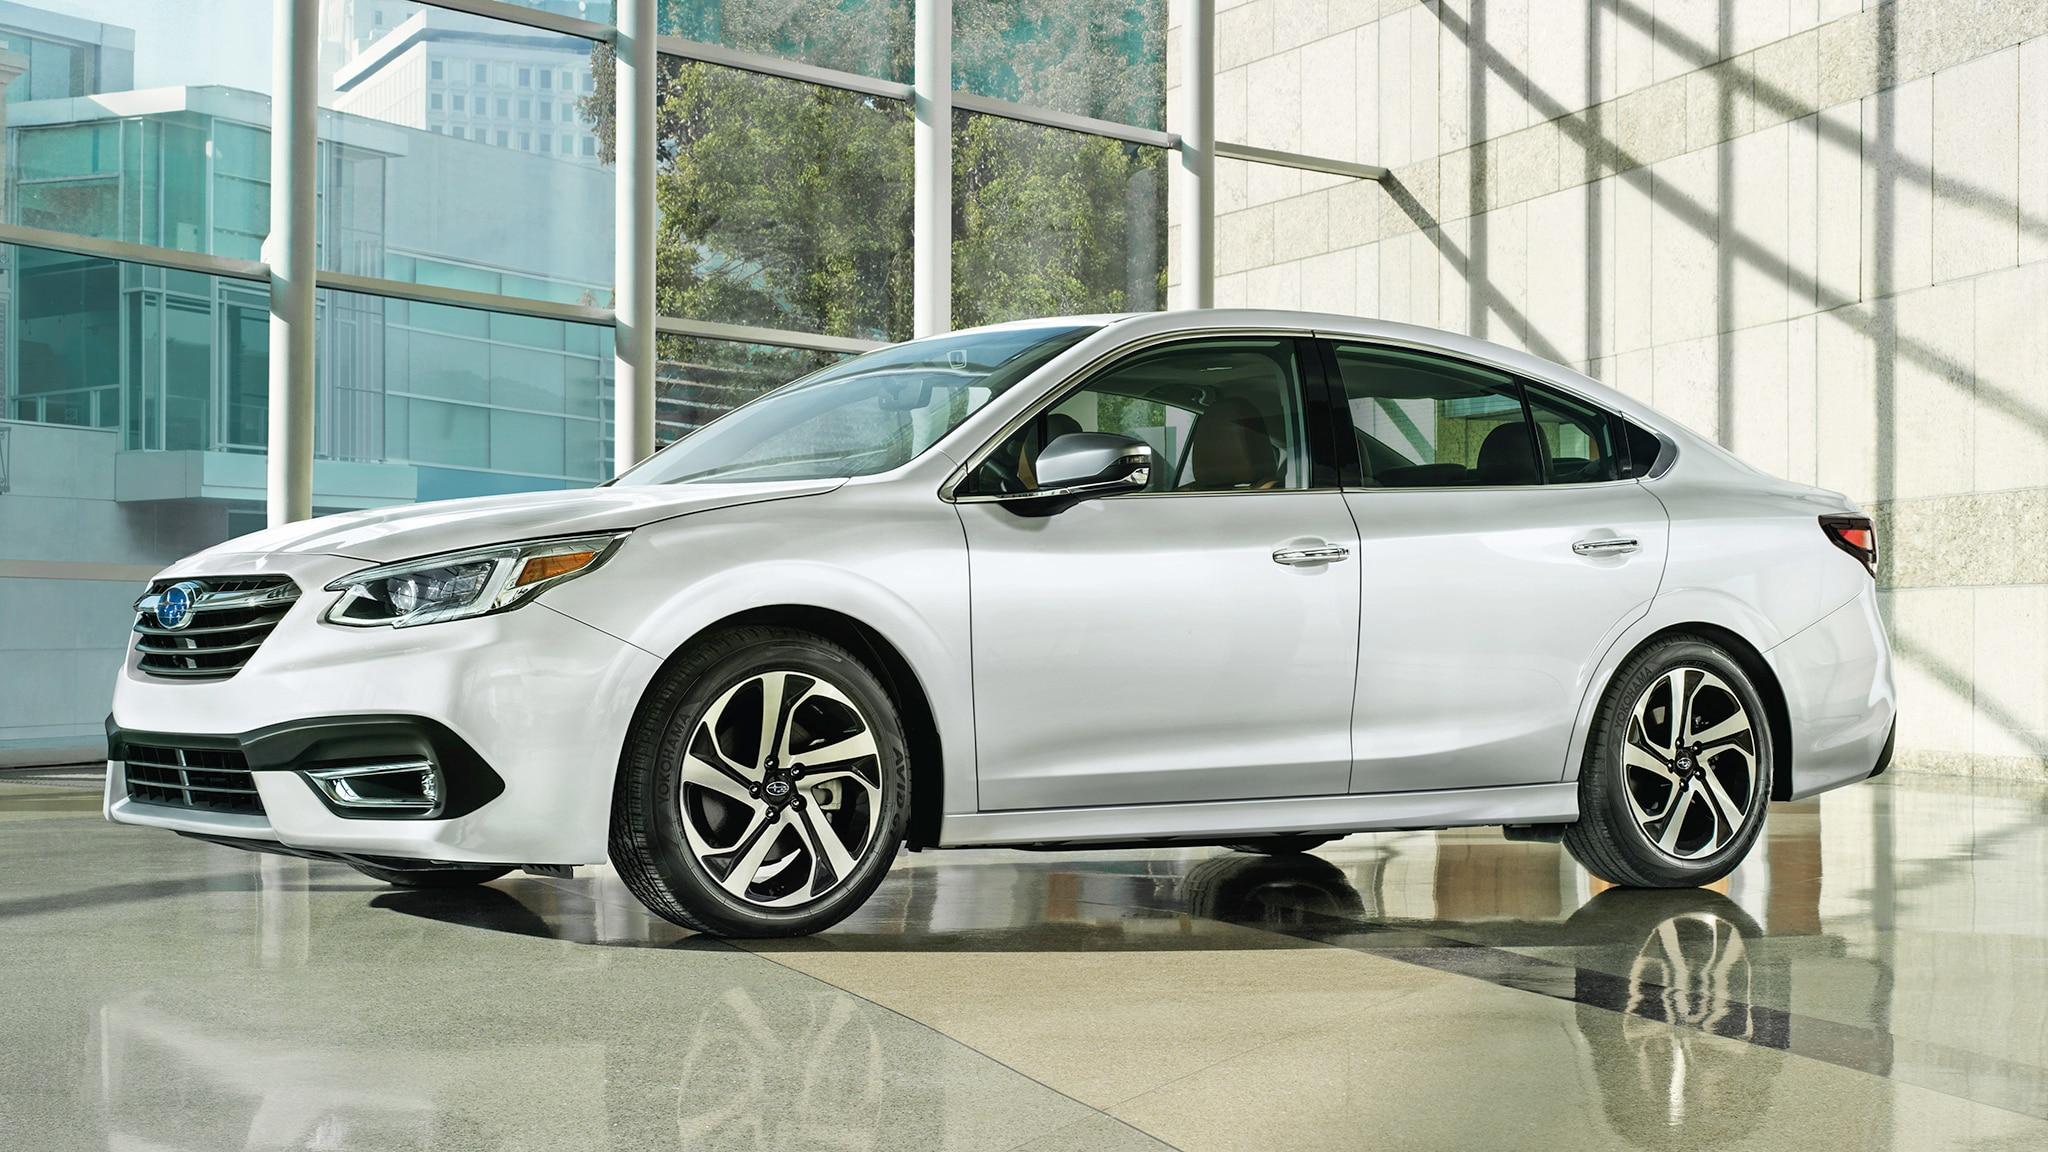 2020 Subaru Legacy Photos and Info: New Platform and New XT